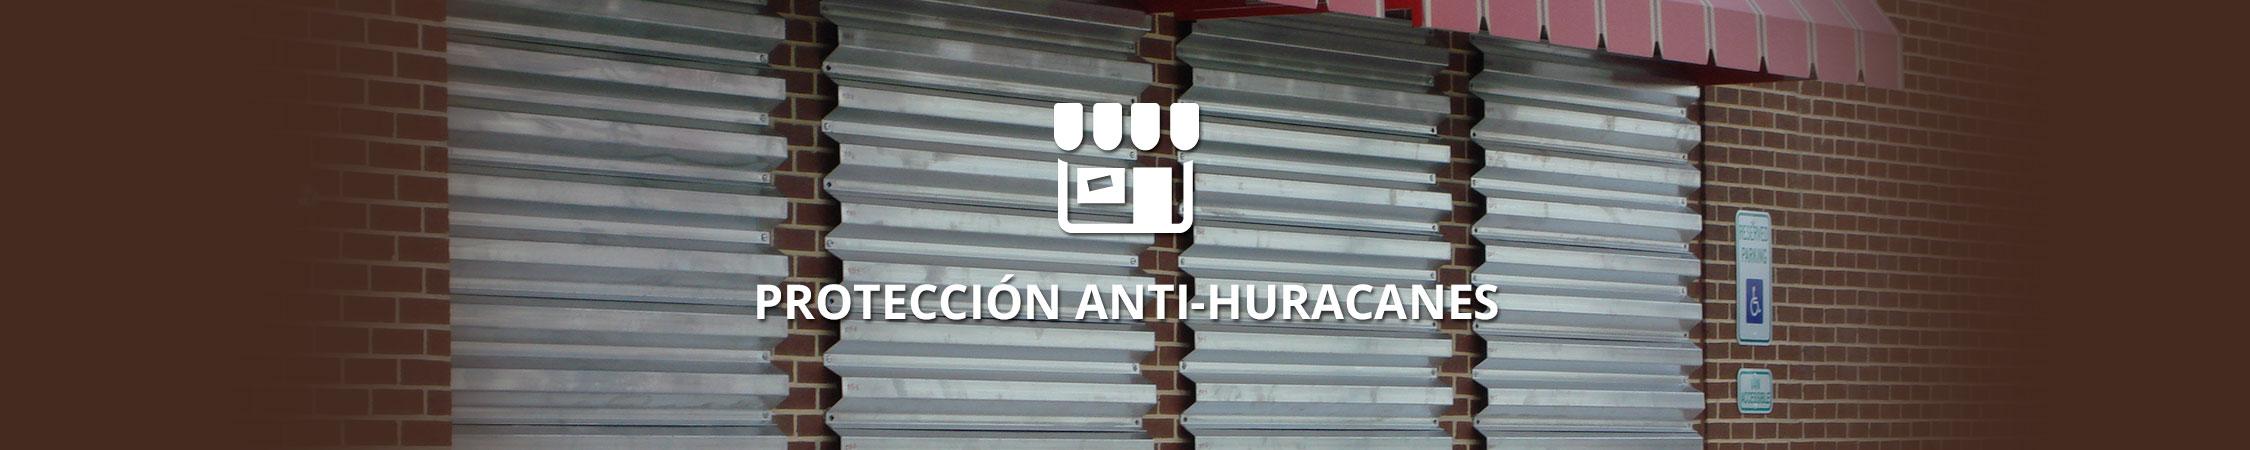 Proteccion Anti-huracanes - Rolltex Shutters